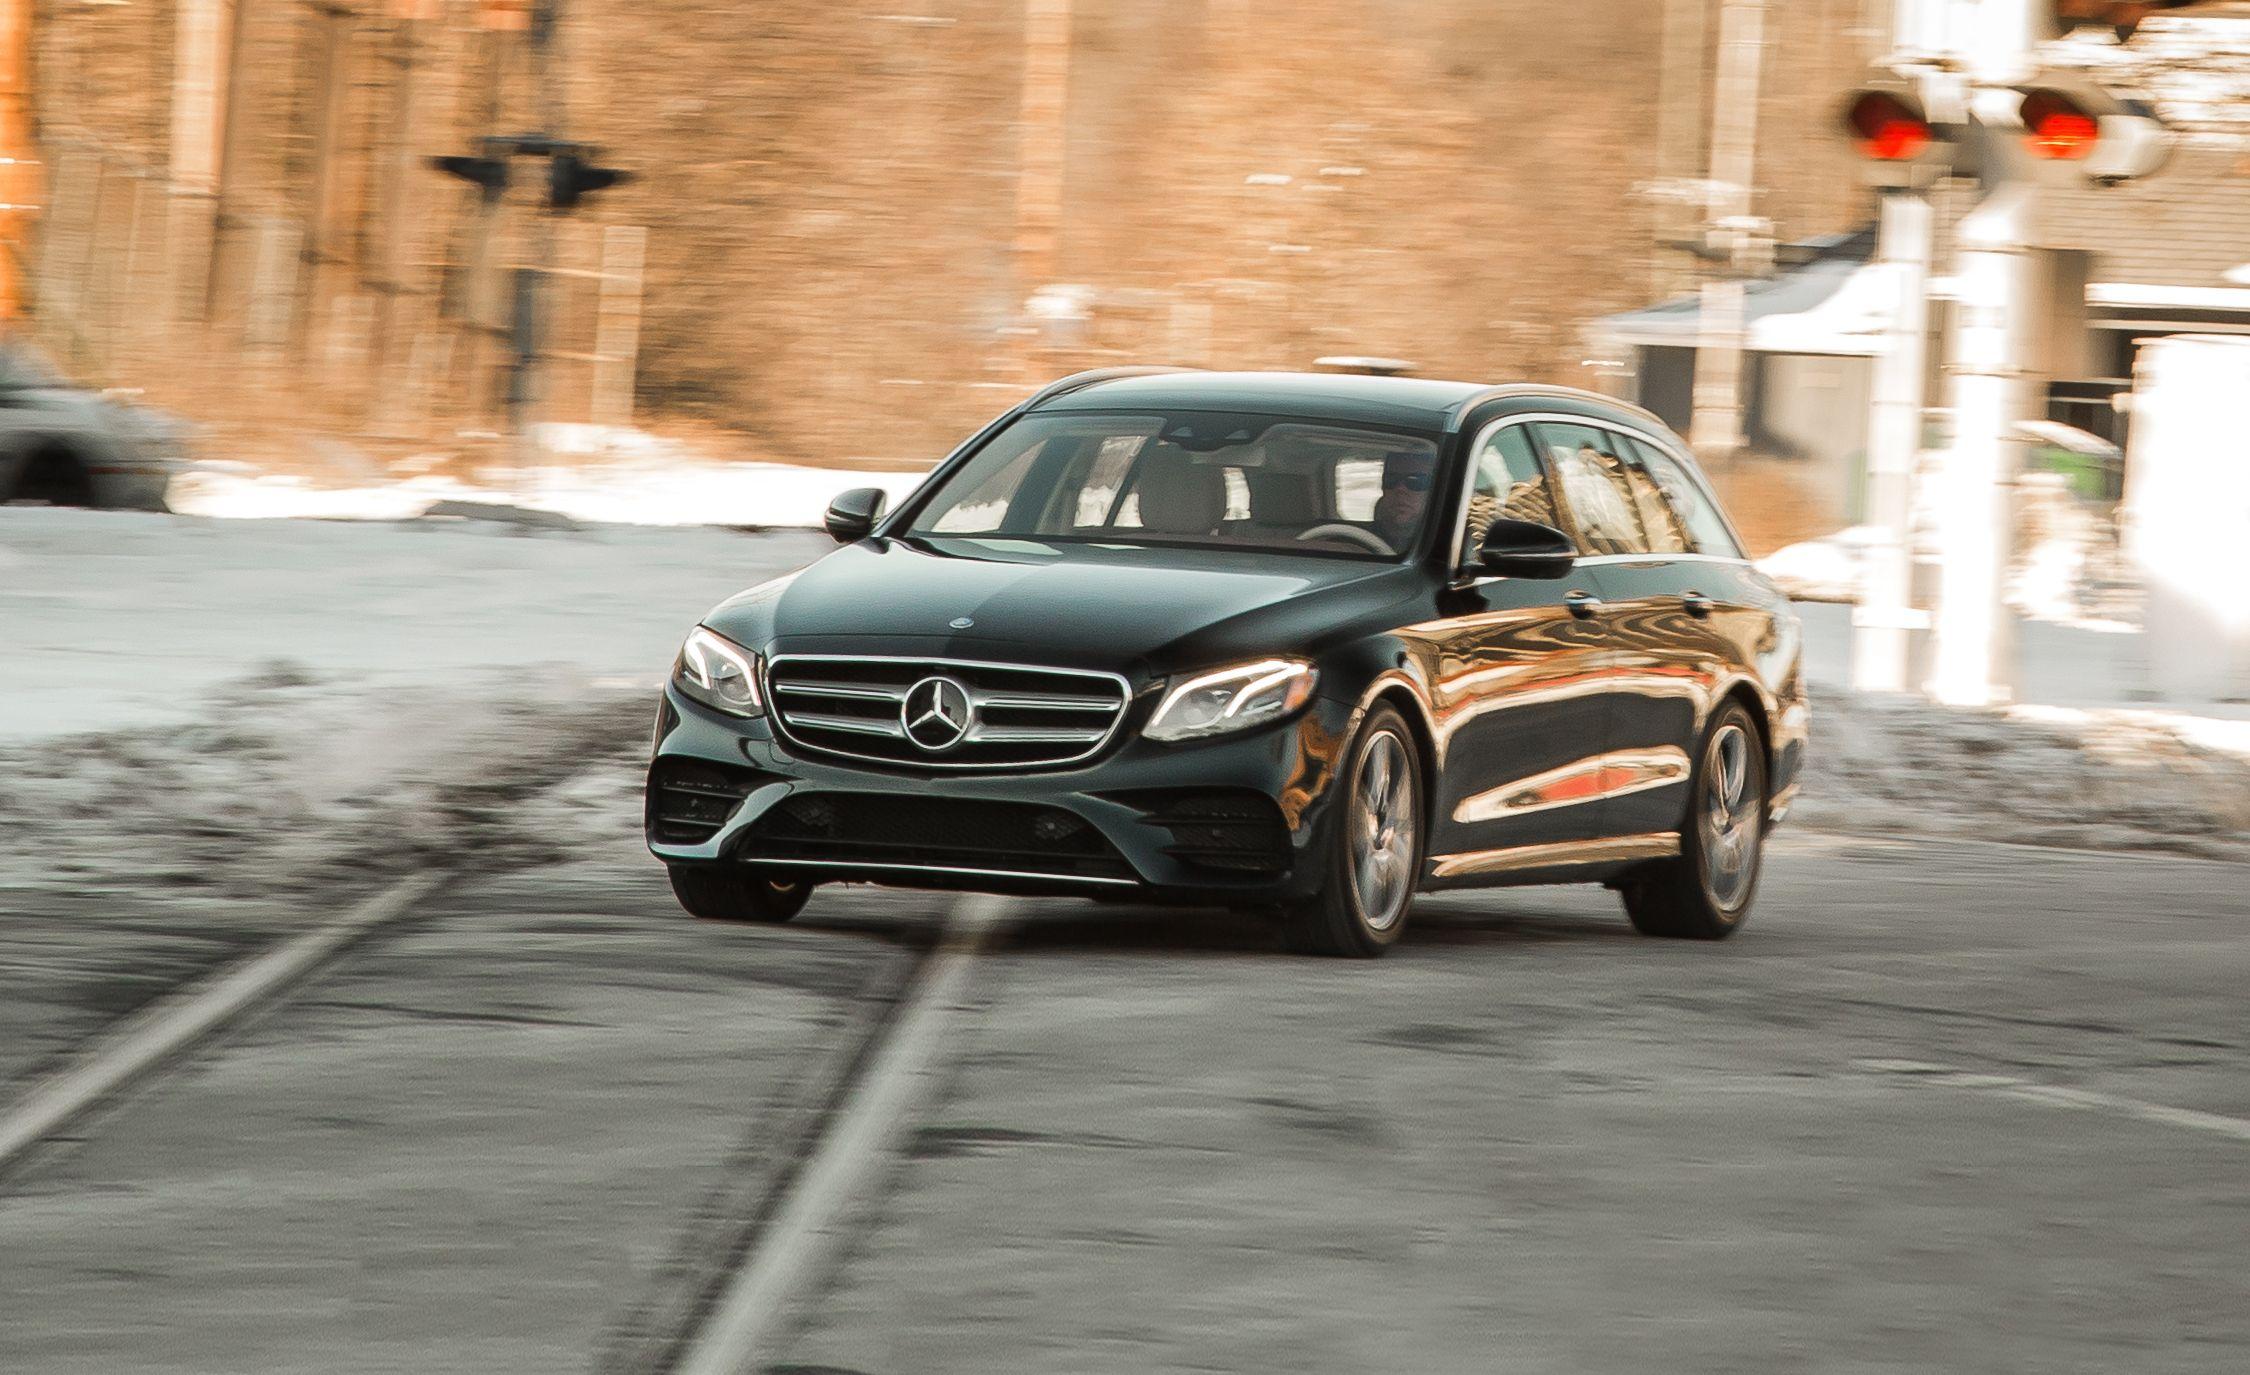 2017 mercedes benz e class wagon in depth model review for Mercedes benz e class 2017 review